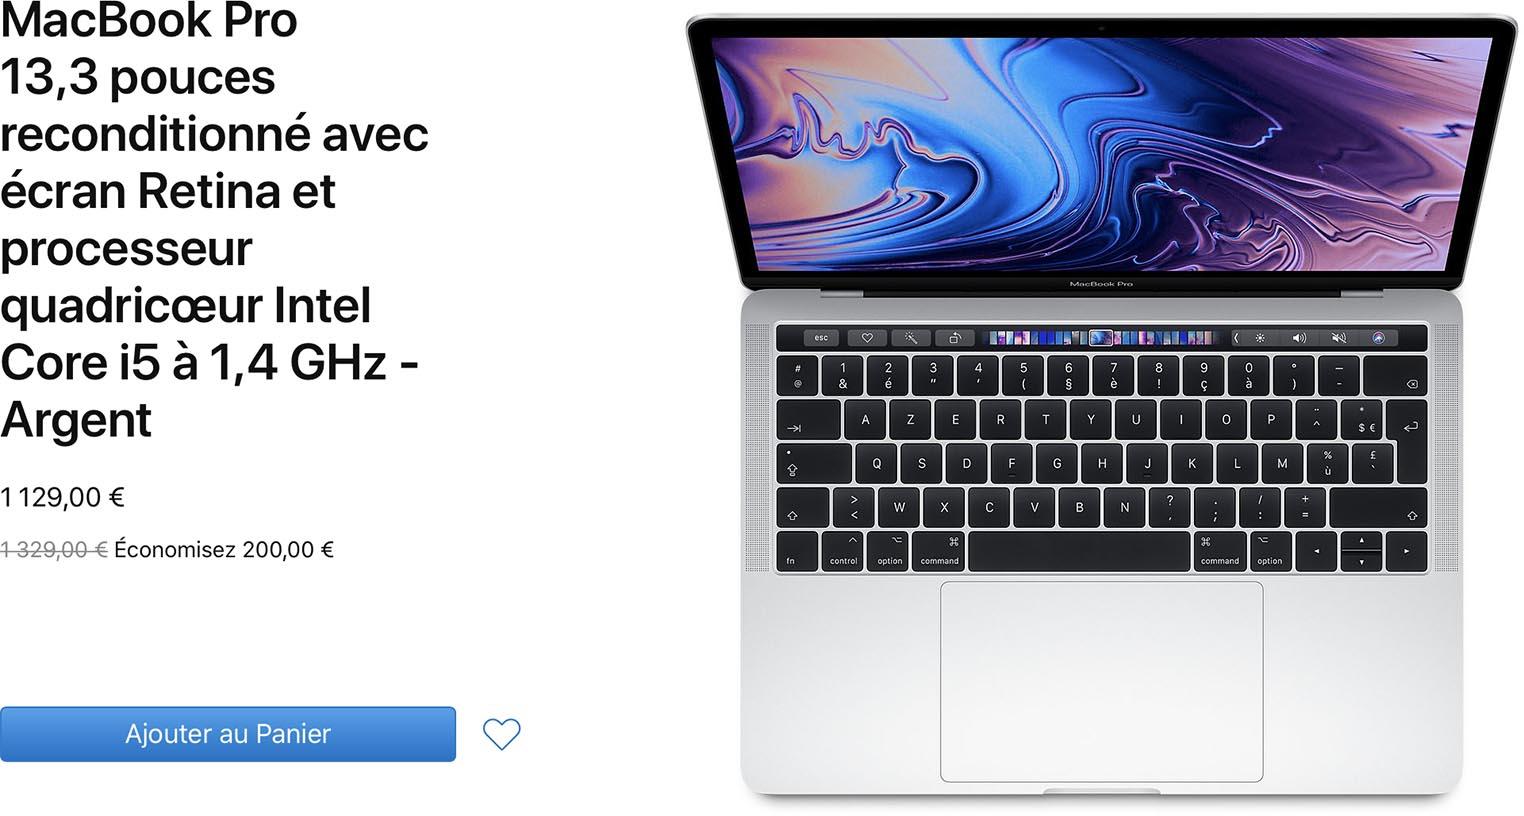 MacBook Pro 2019 Refurb Store